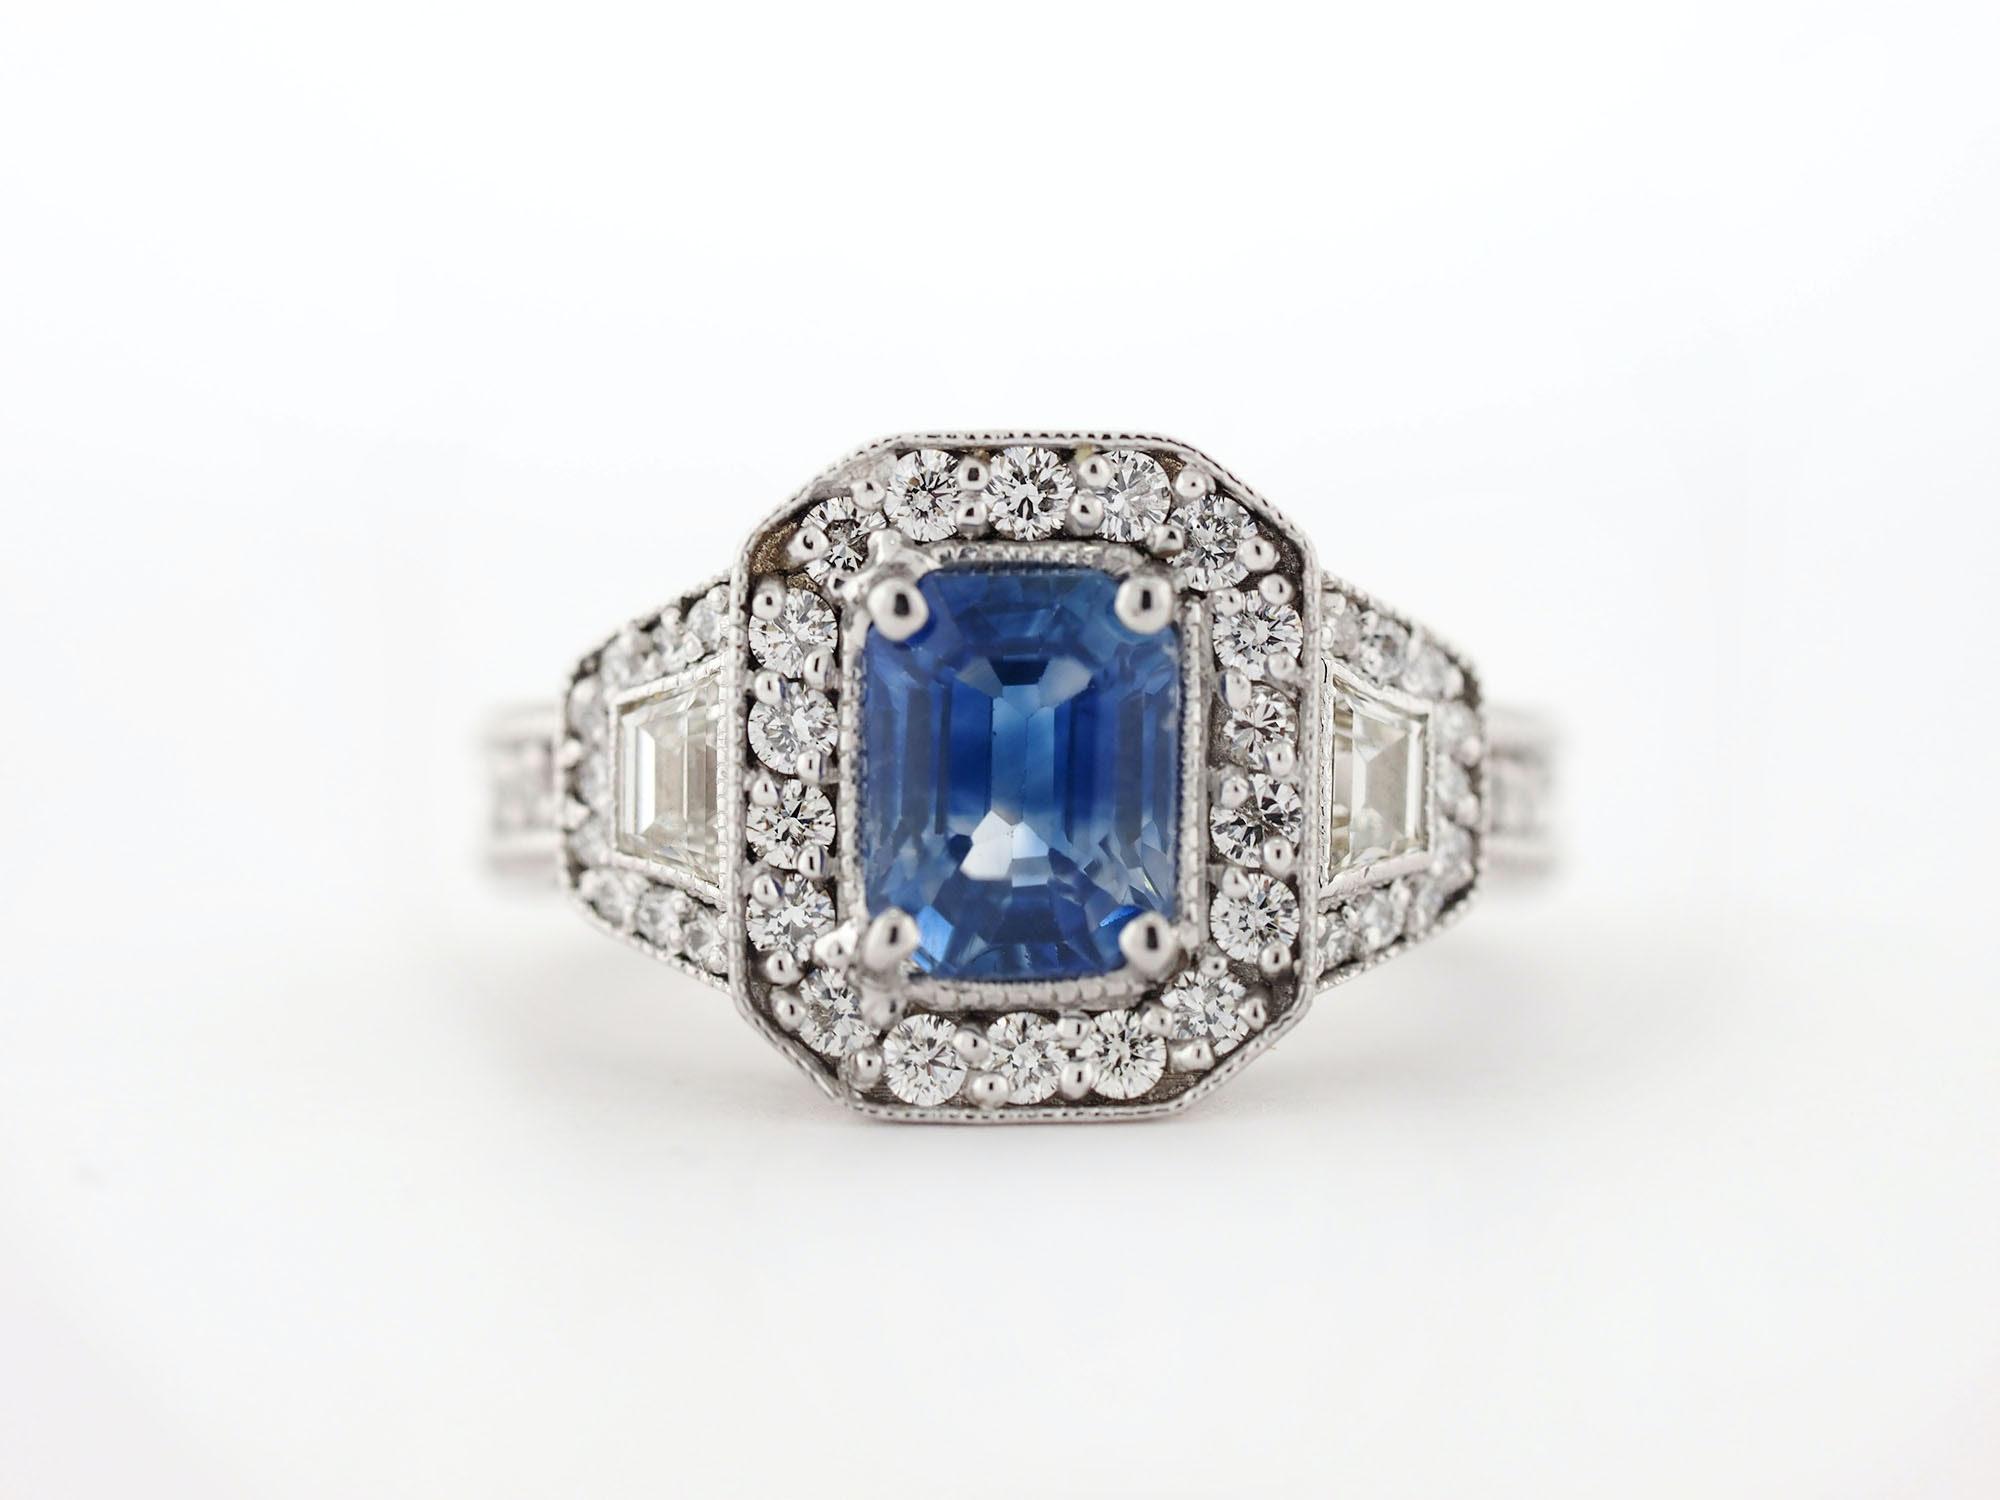 18K White Gold 1.95 CT Sapphire and 2.10 CTW Diamond Ring